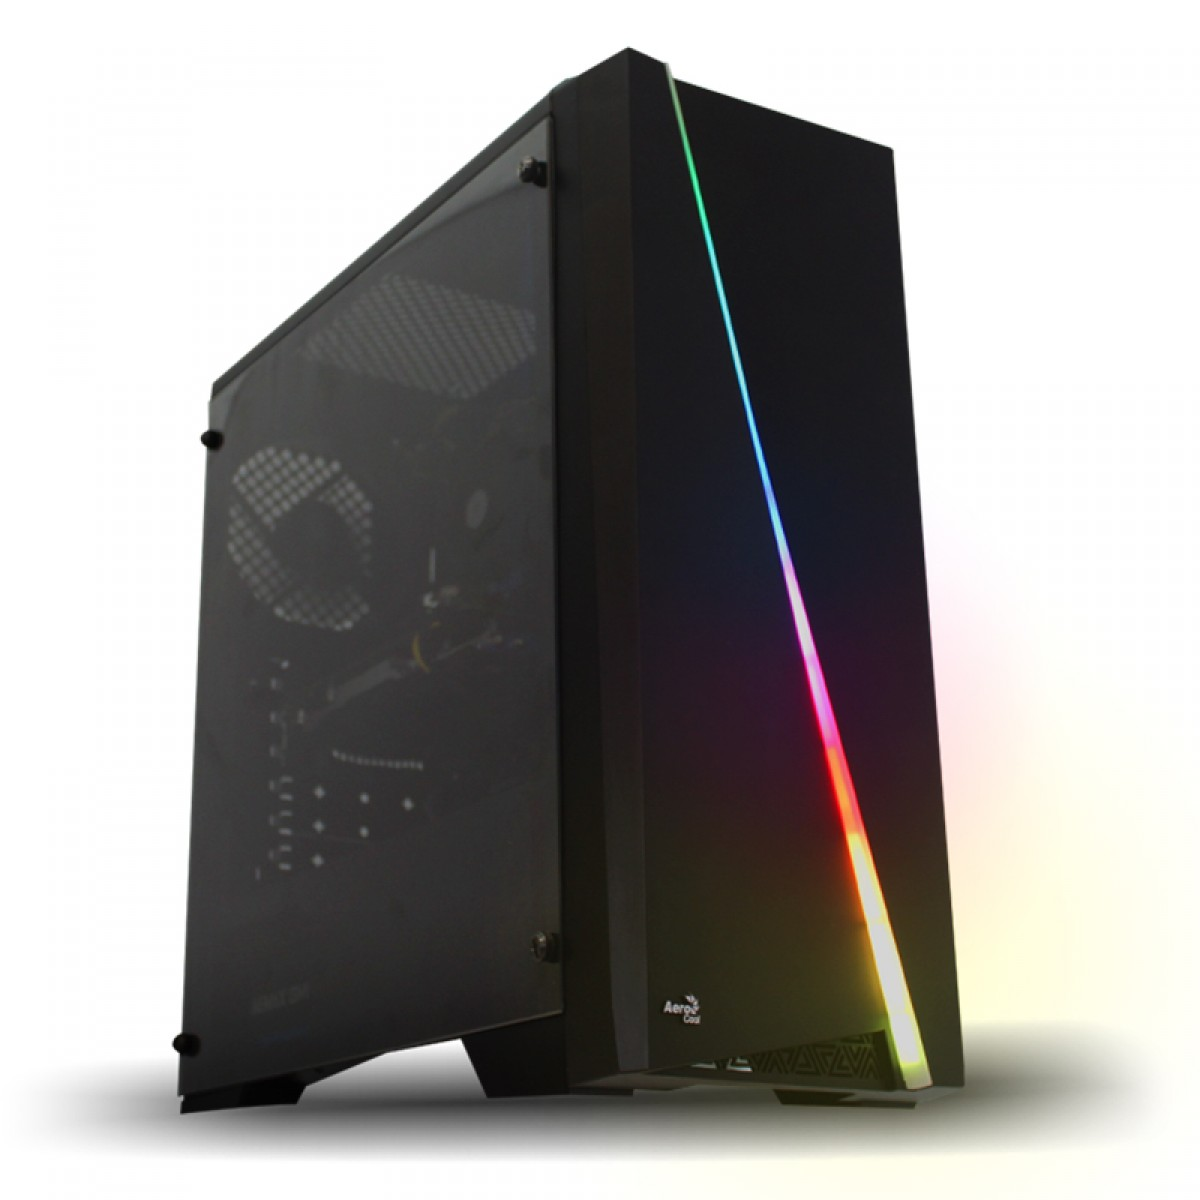 Pc Gamer T-Moba Gladiator Lvl-3 Intel Pentium G5400 / Geforce GTX 1650 4GB / DDR4 8GB / HD 1TB